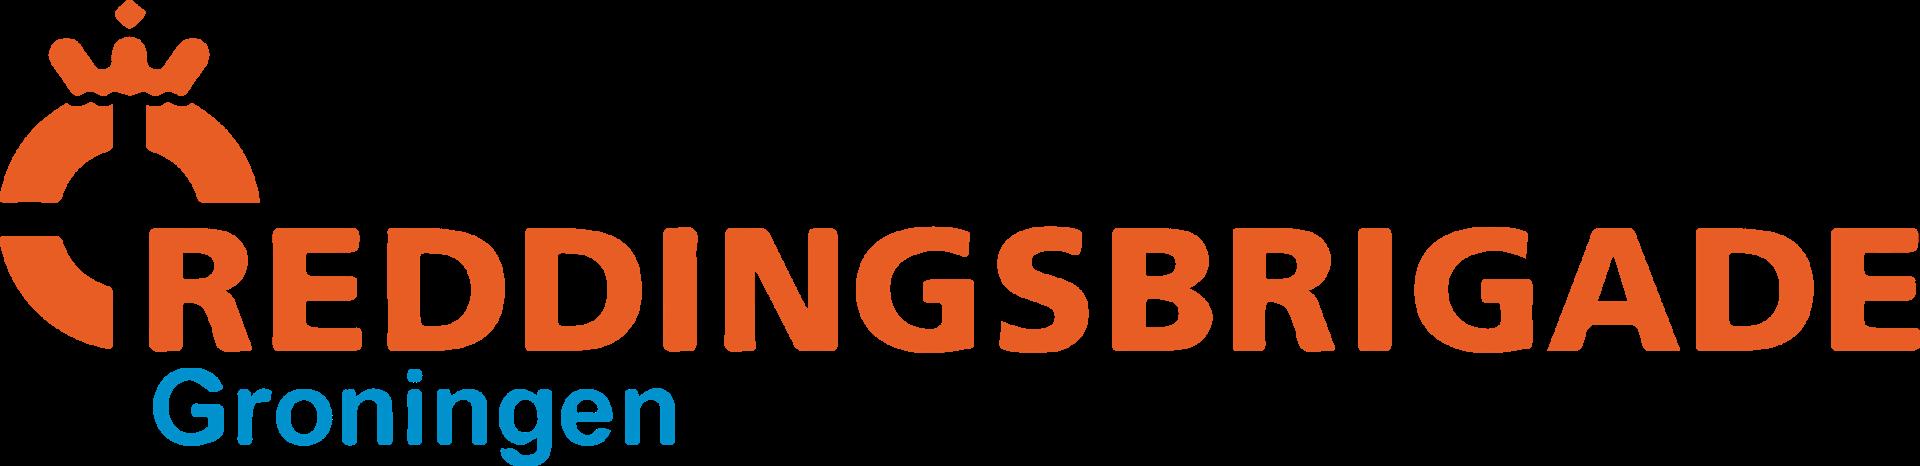 logo Groninger Reddingsbrigade